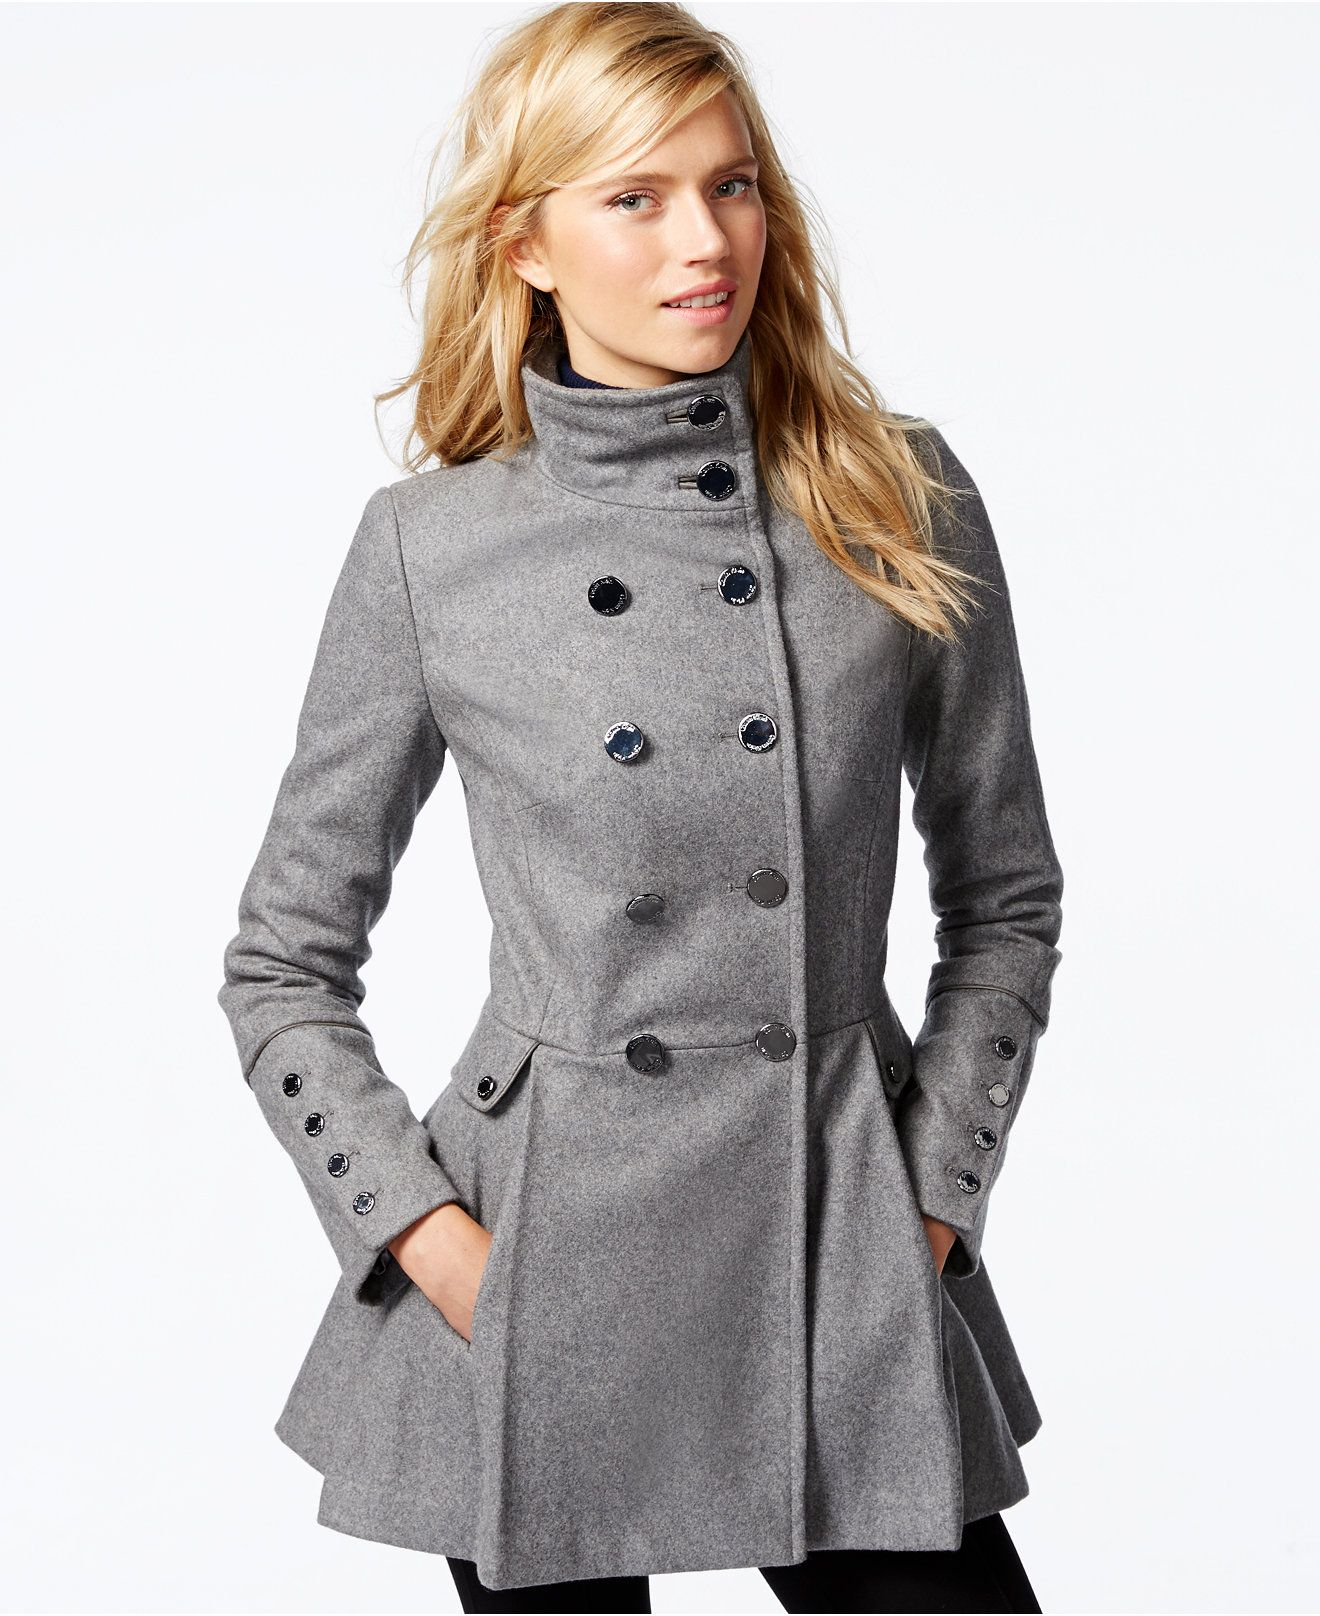 8551dfc763f Calvin Klein Stand-Collar Pleated Peacoat - Coats - Women - Macy s ...